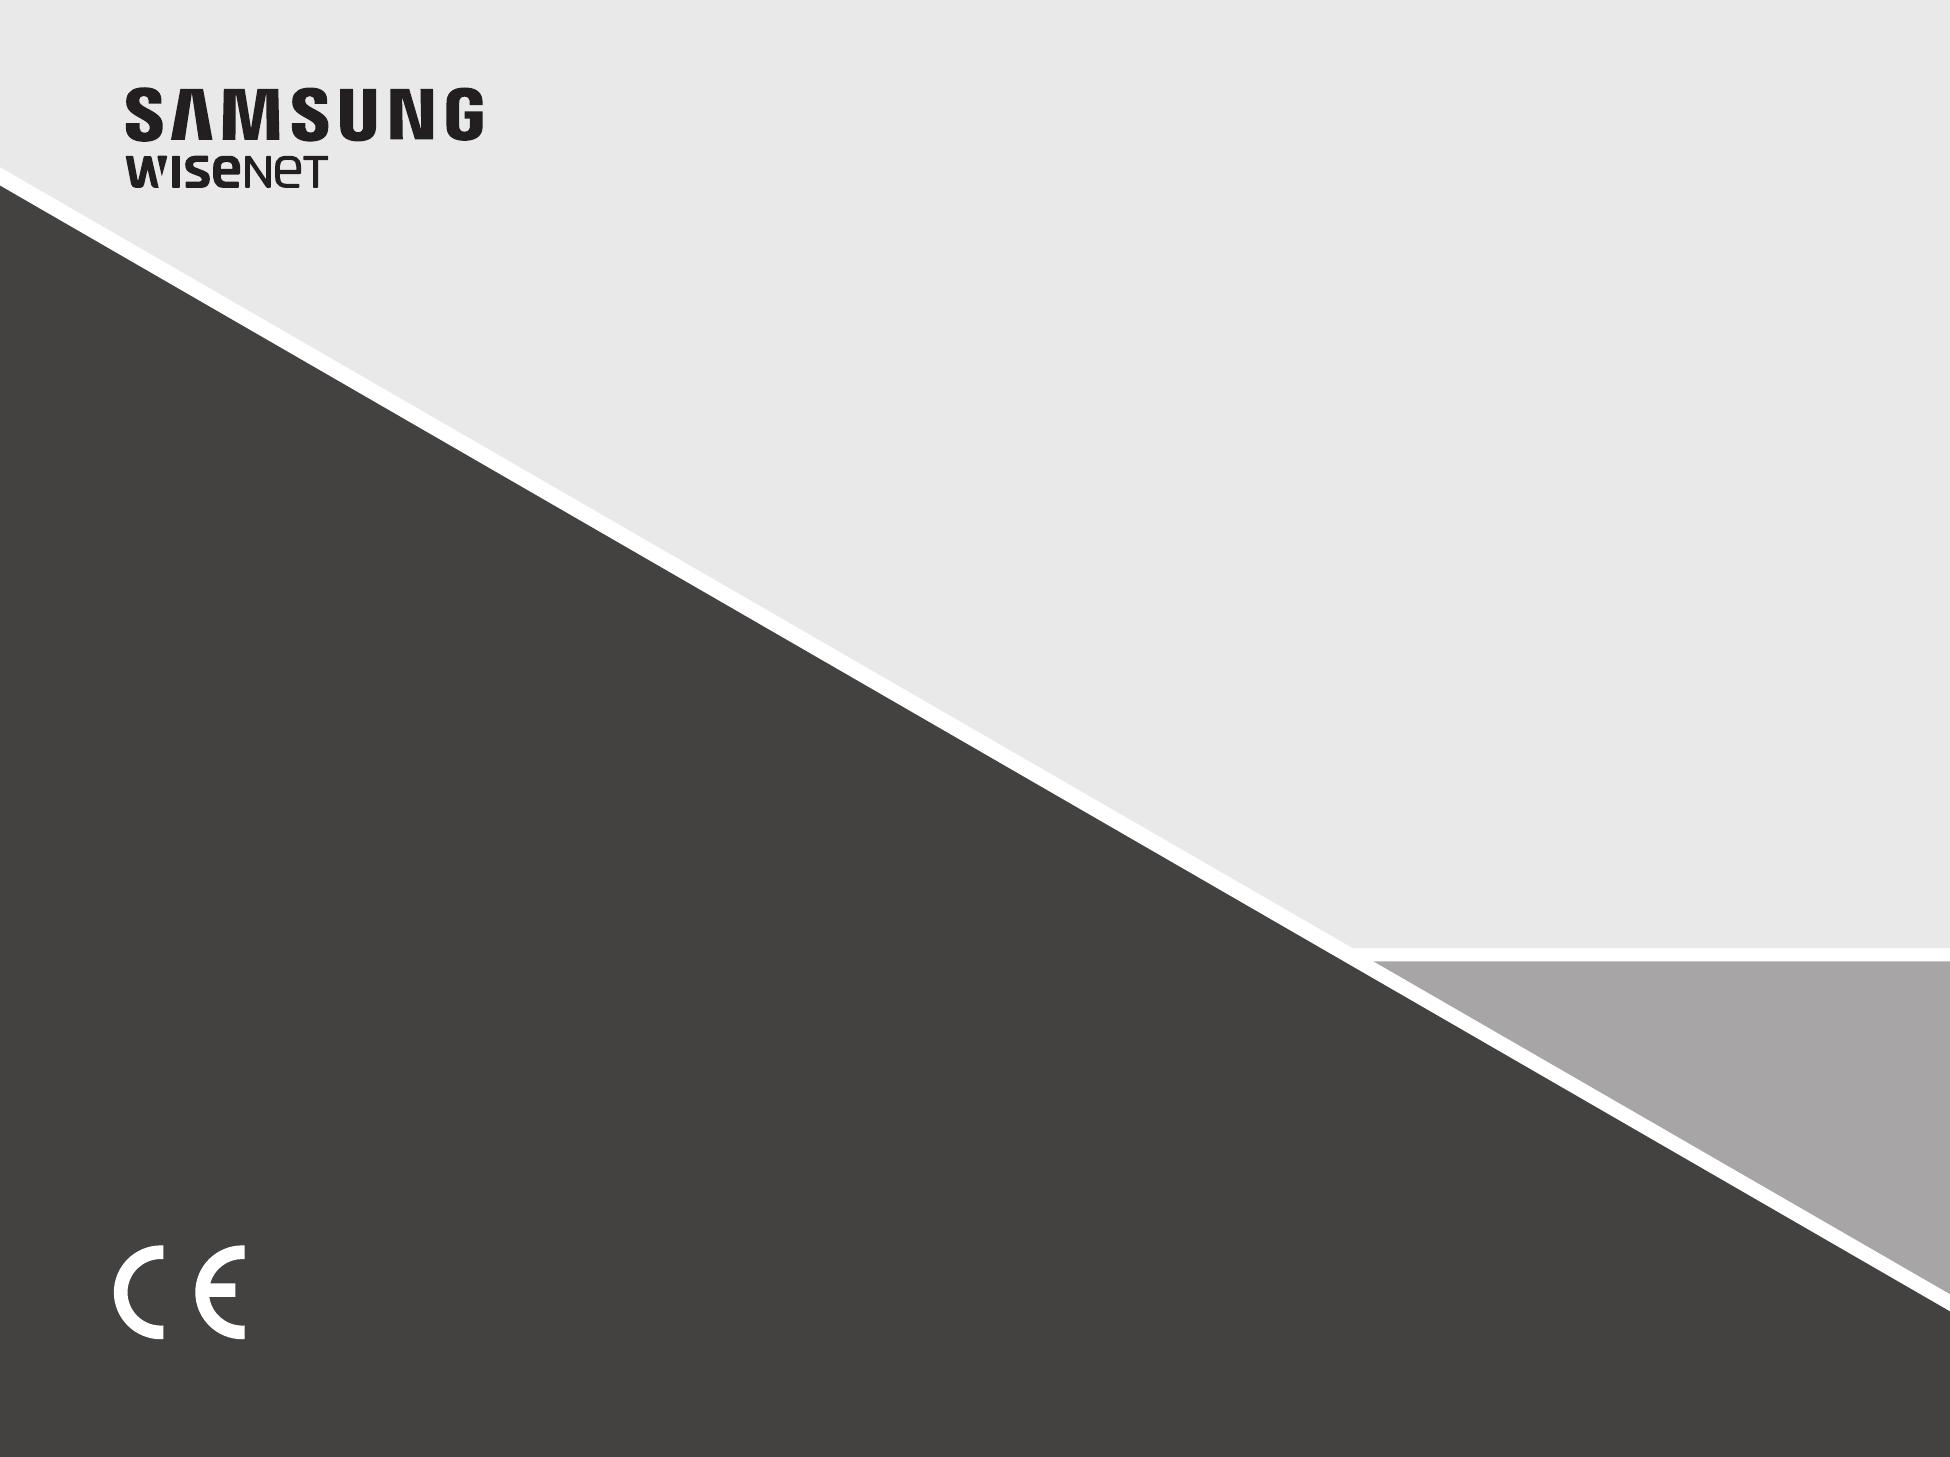 Samsung Prn 4011 Manual Event Failure Alarm 555 Circuit 555556 Timer Network Video Recorder